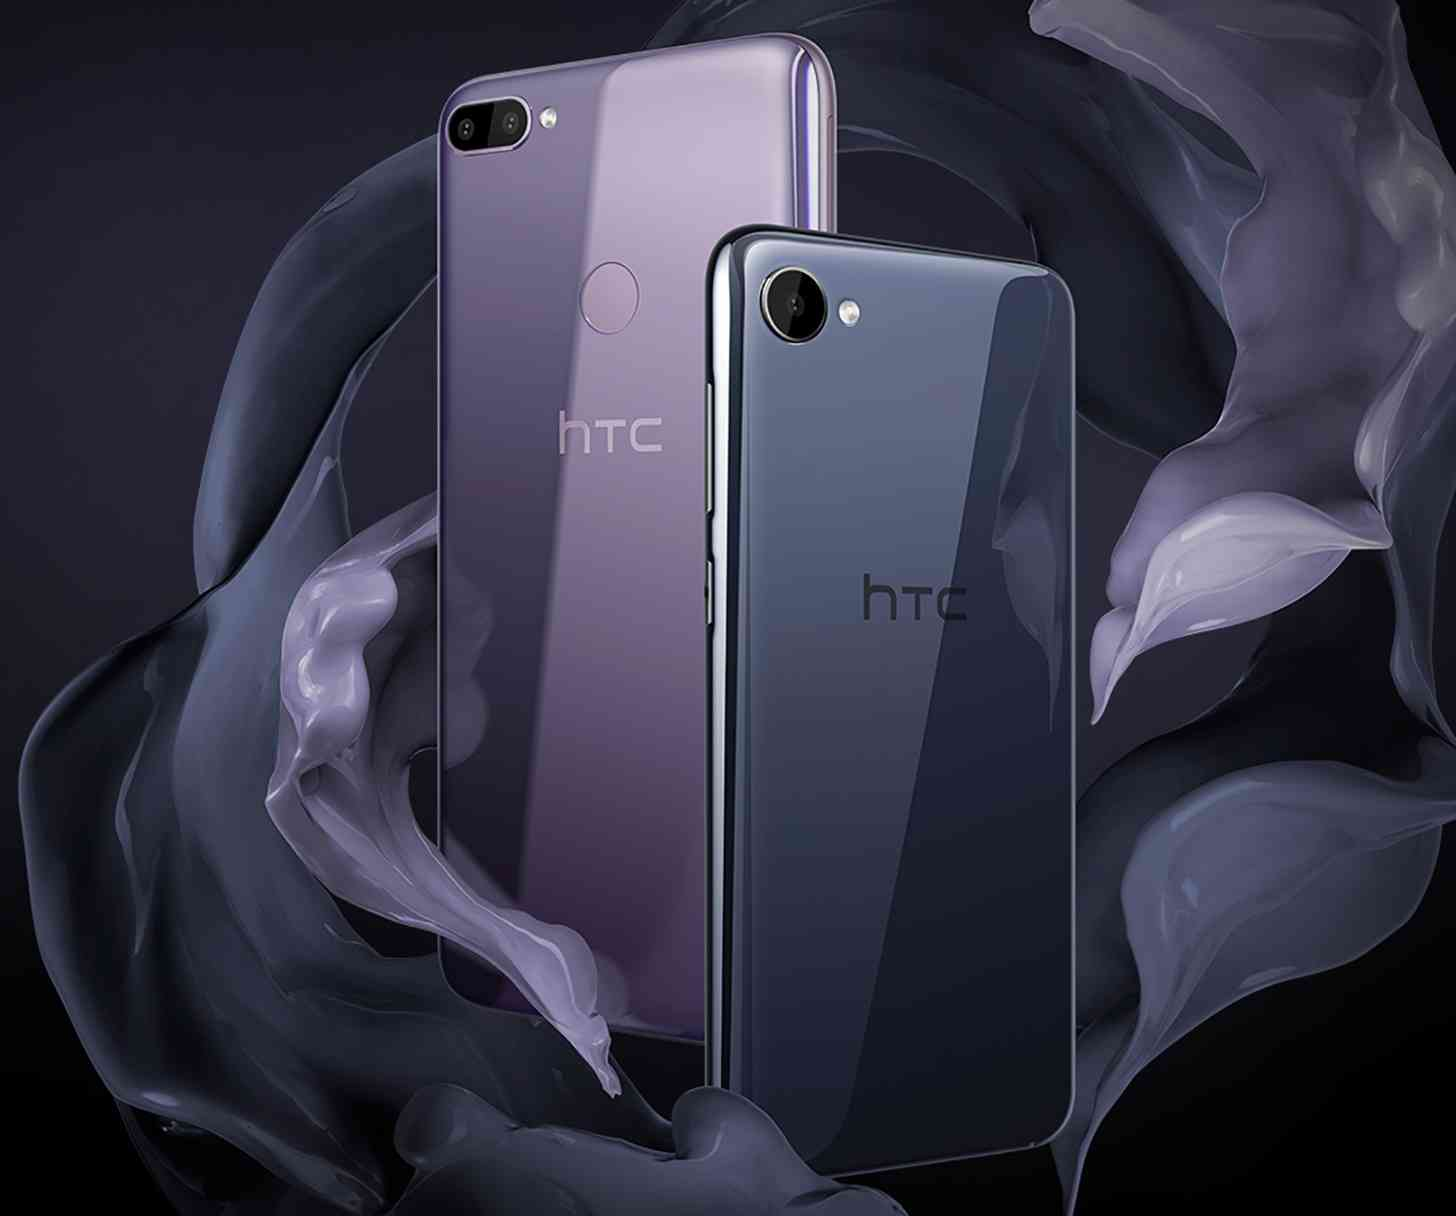 HTC Desire 12, Desire 12+ official